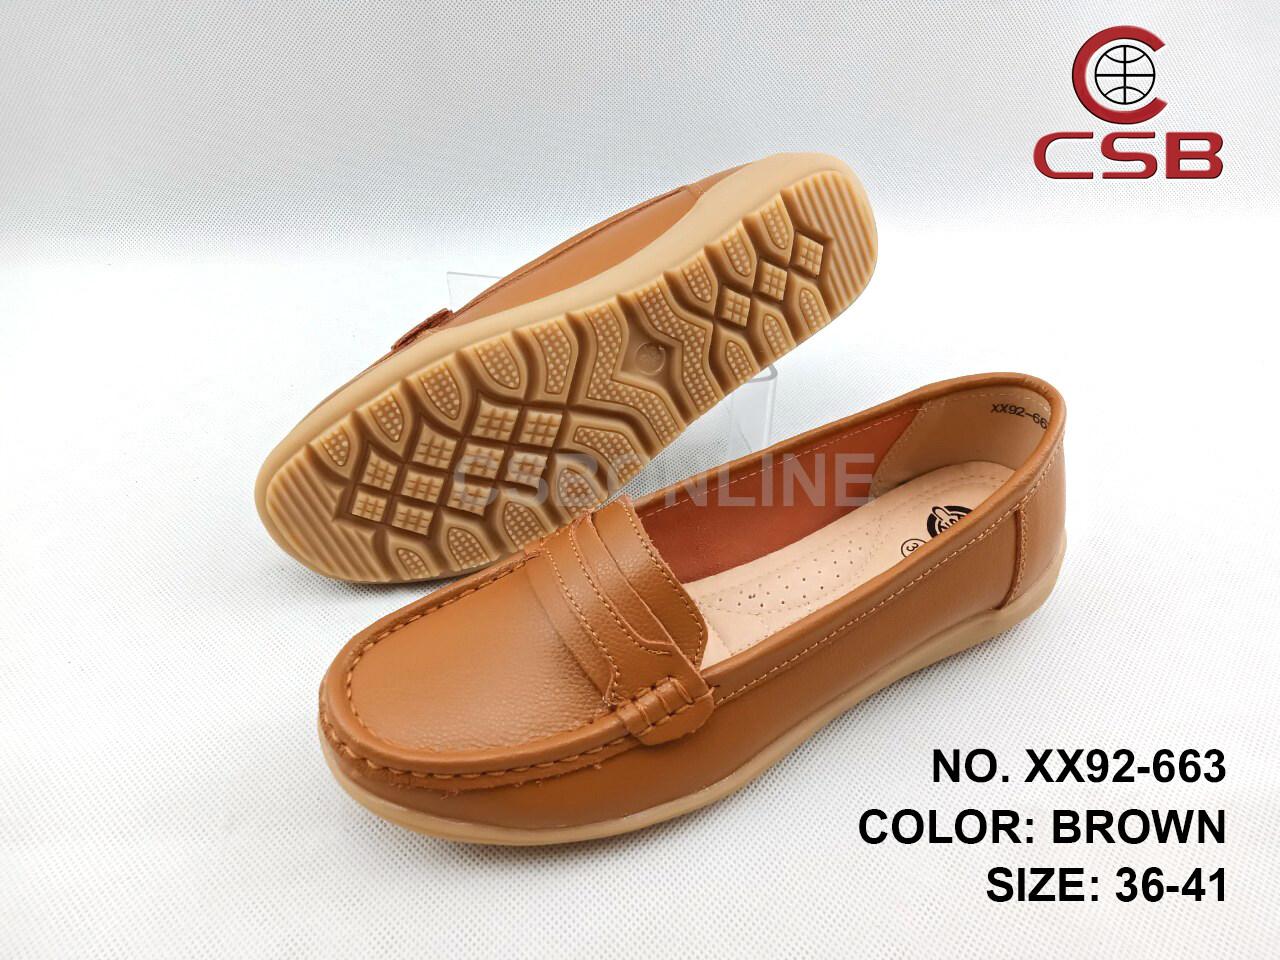 XX92-663 รองเท้าแฟชั่น Moccasin ทำจากหนังแท้ ? ไซส์ปกติ พื้นทำจากยางพารากันพื้นลื่นได้ดี